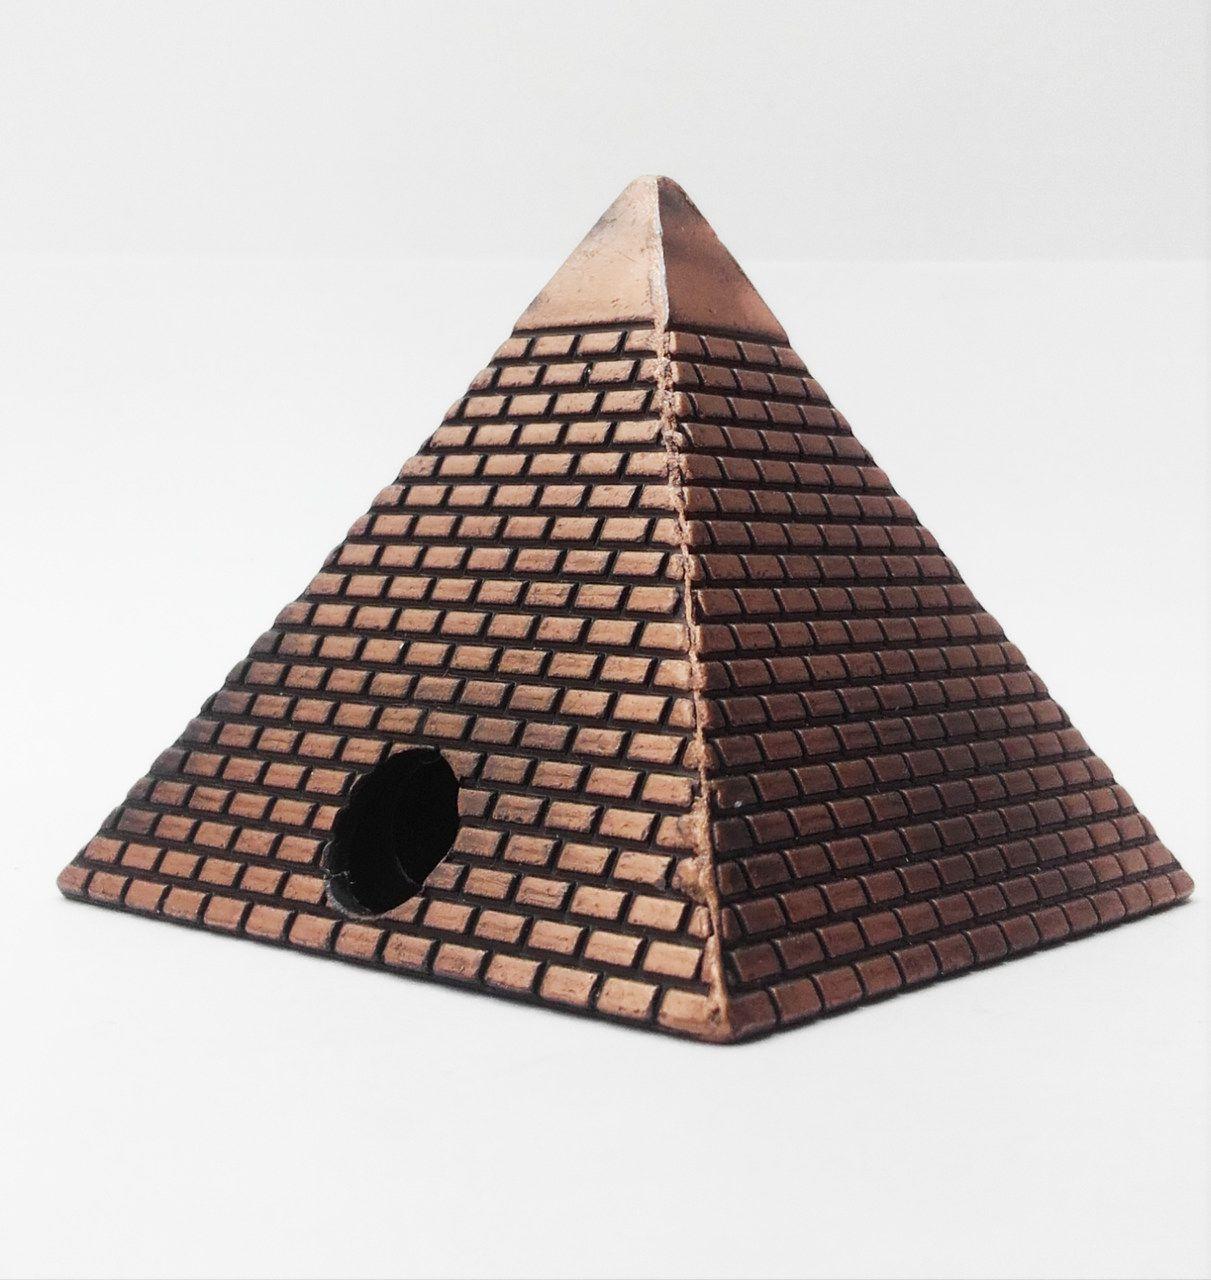 Apontador De Metal: Pirâmide